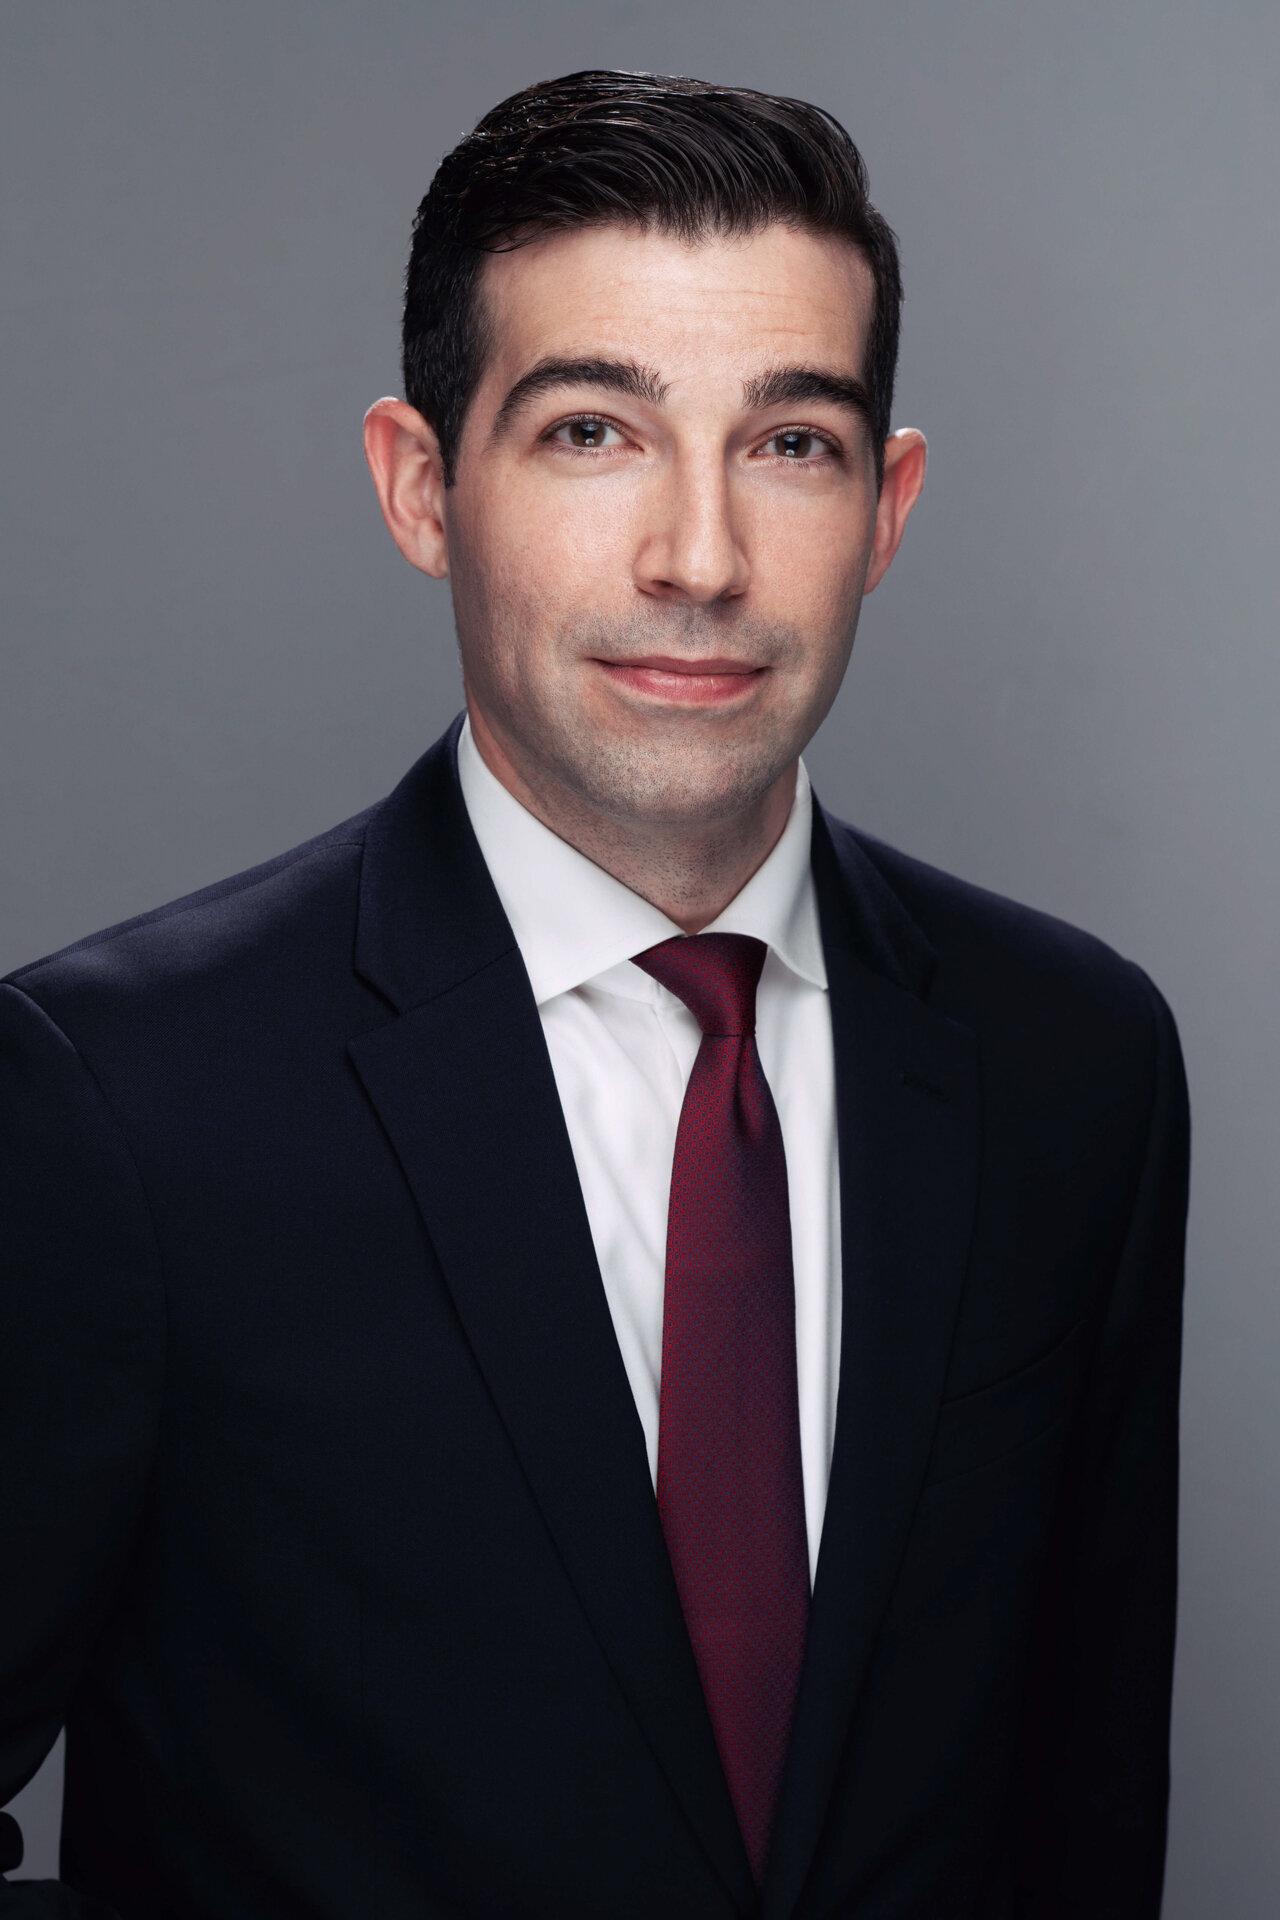 David Cvengros